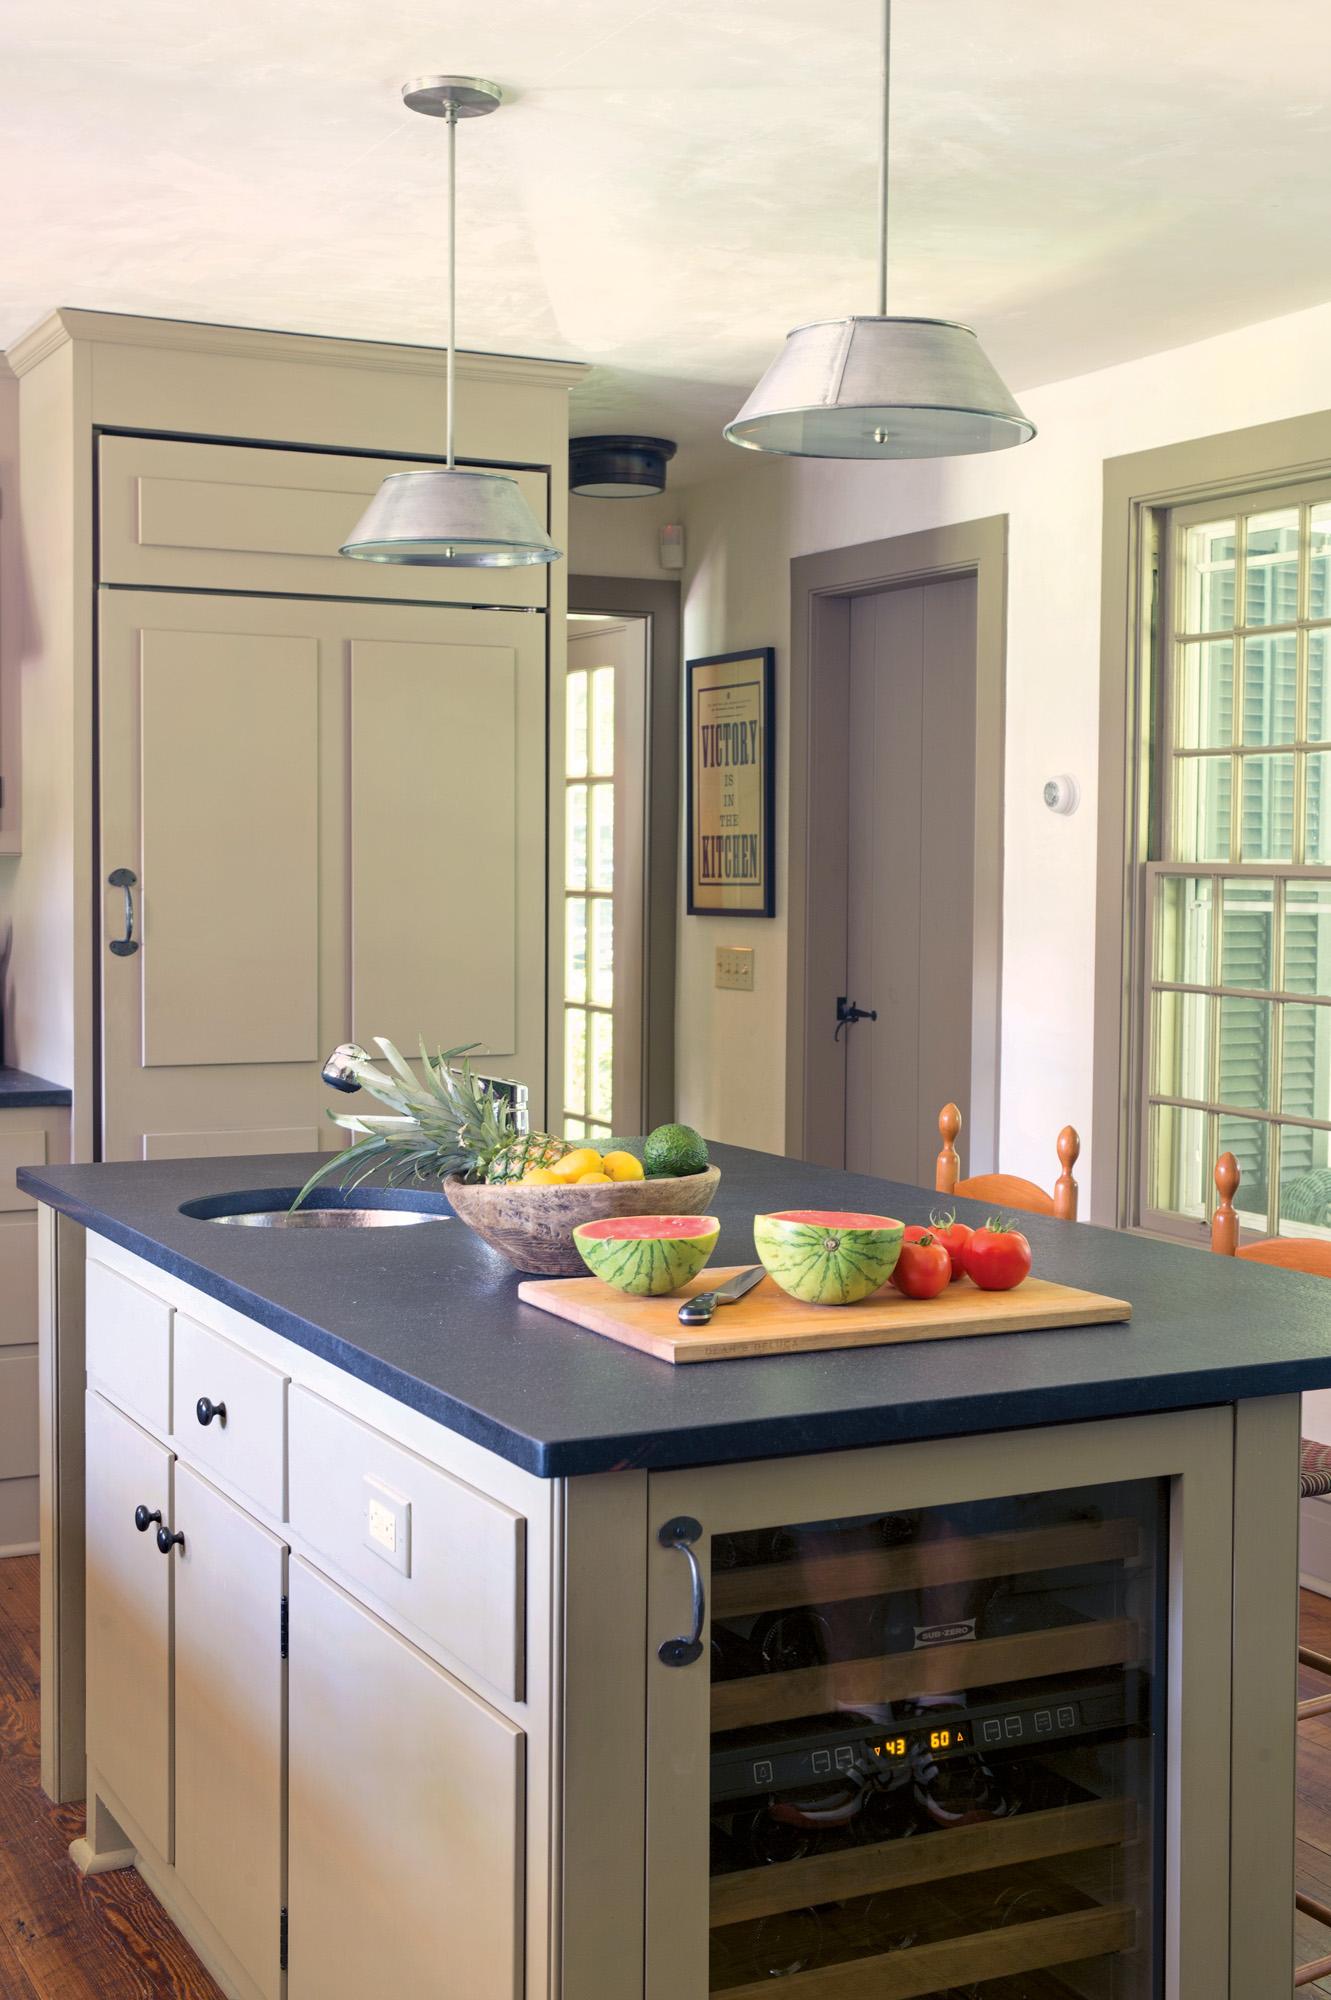 kitchen isl fridg 1575_gn